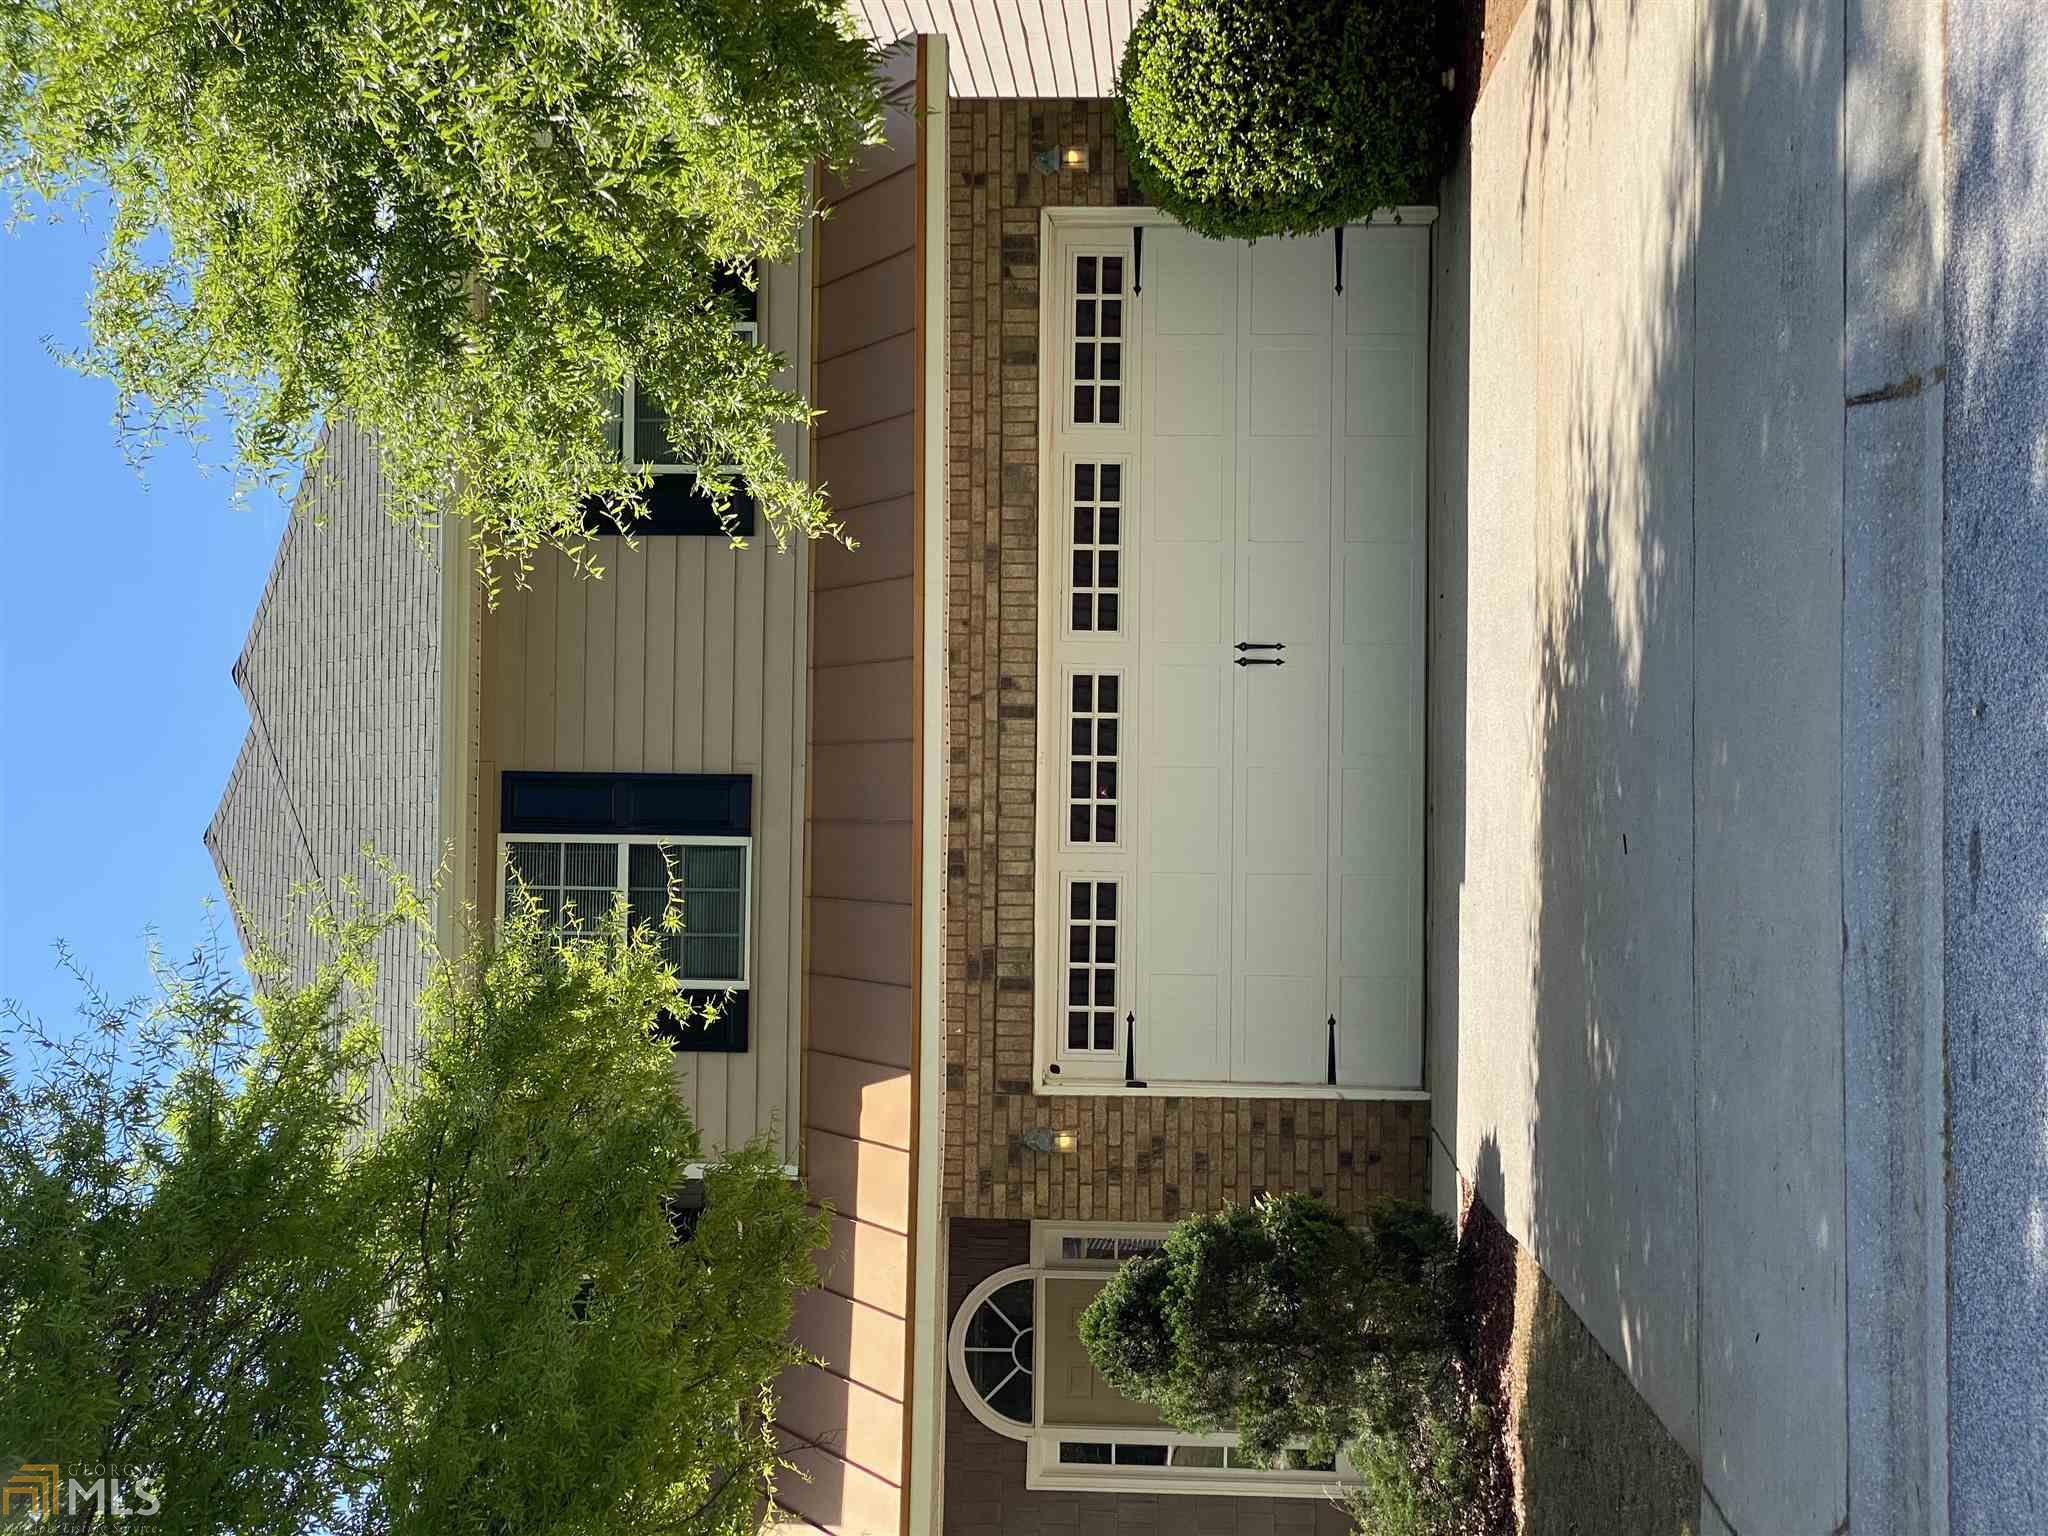 355 Clover Brook, Locust Grove, Georgia 30248, 3 Bedrooms Bedrooms, ,3 BathroomsBathrooms,Single Family,For Sale,355 Clover Brook,2,8964345